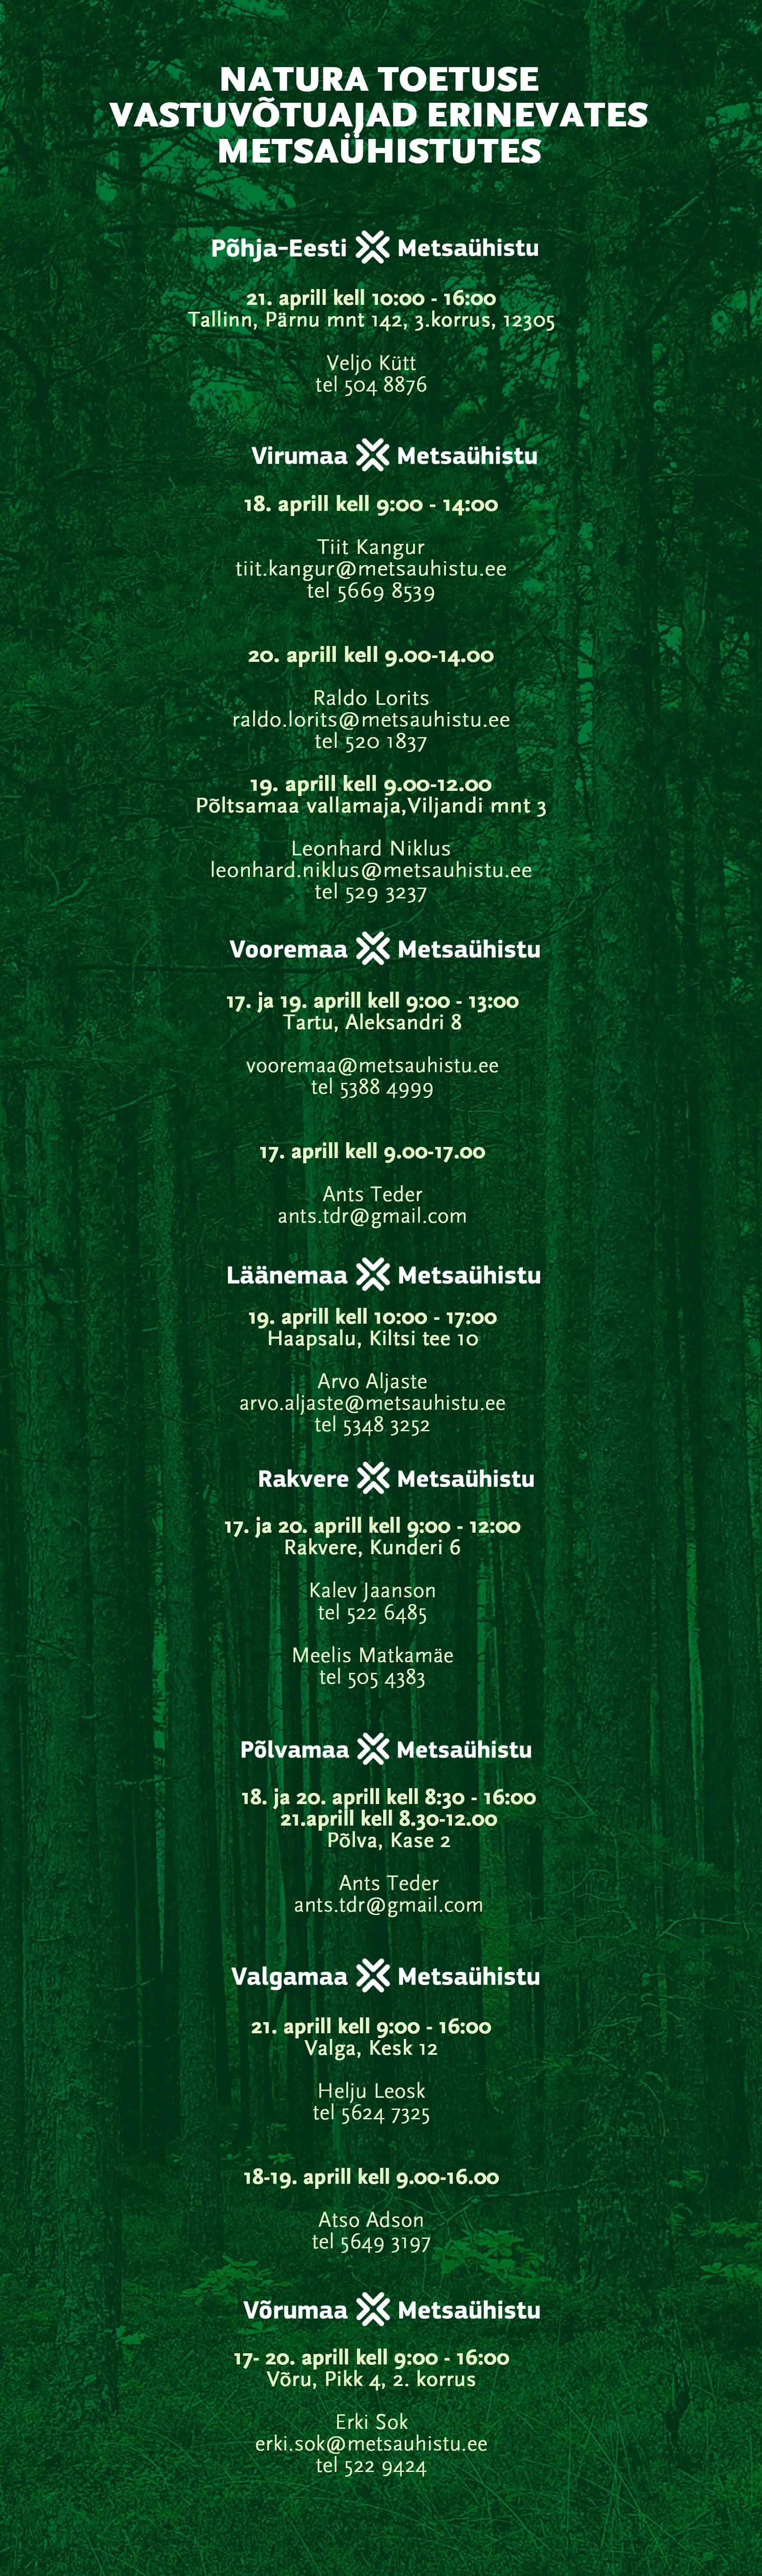 metsauhistu-natura2000